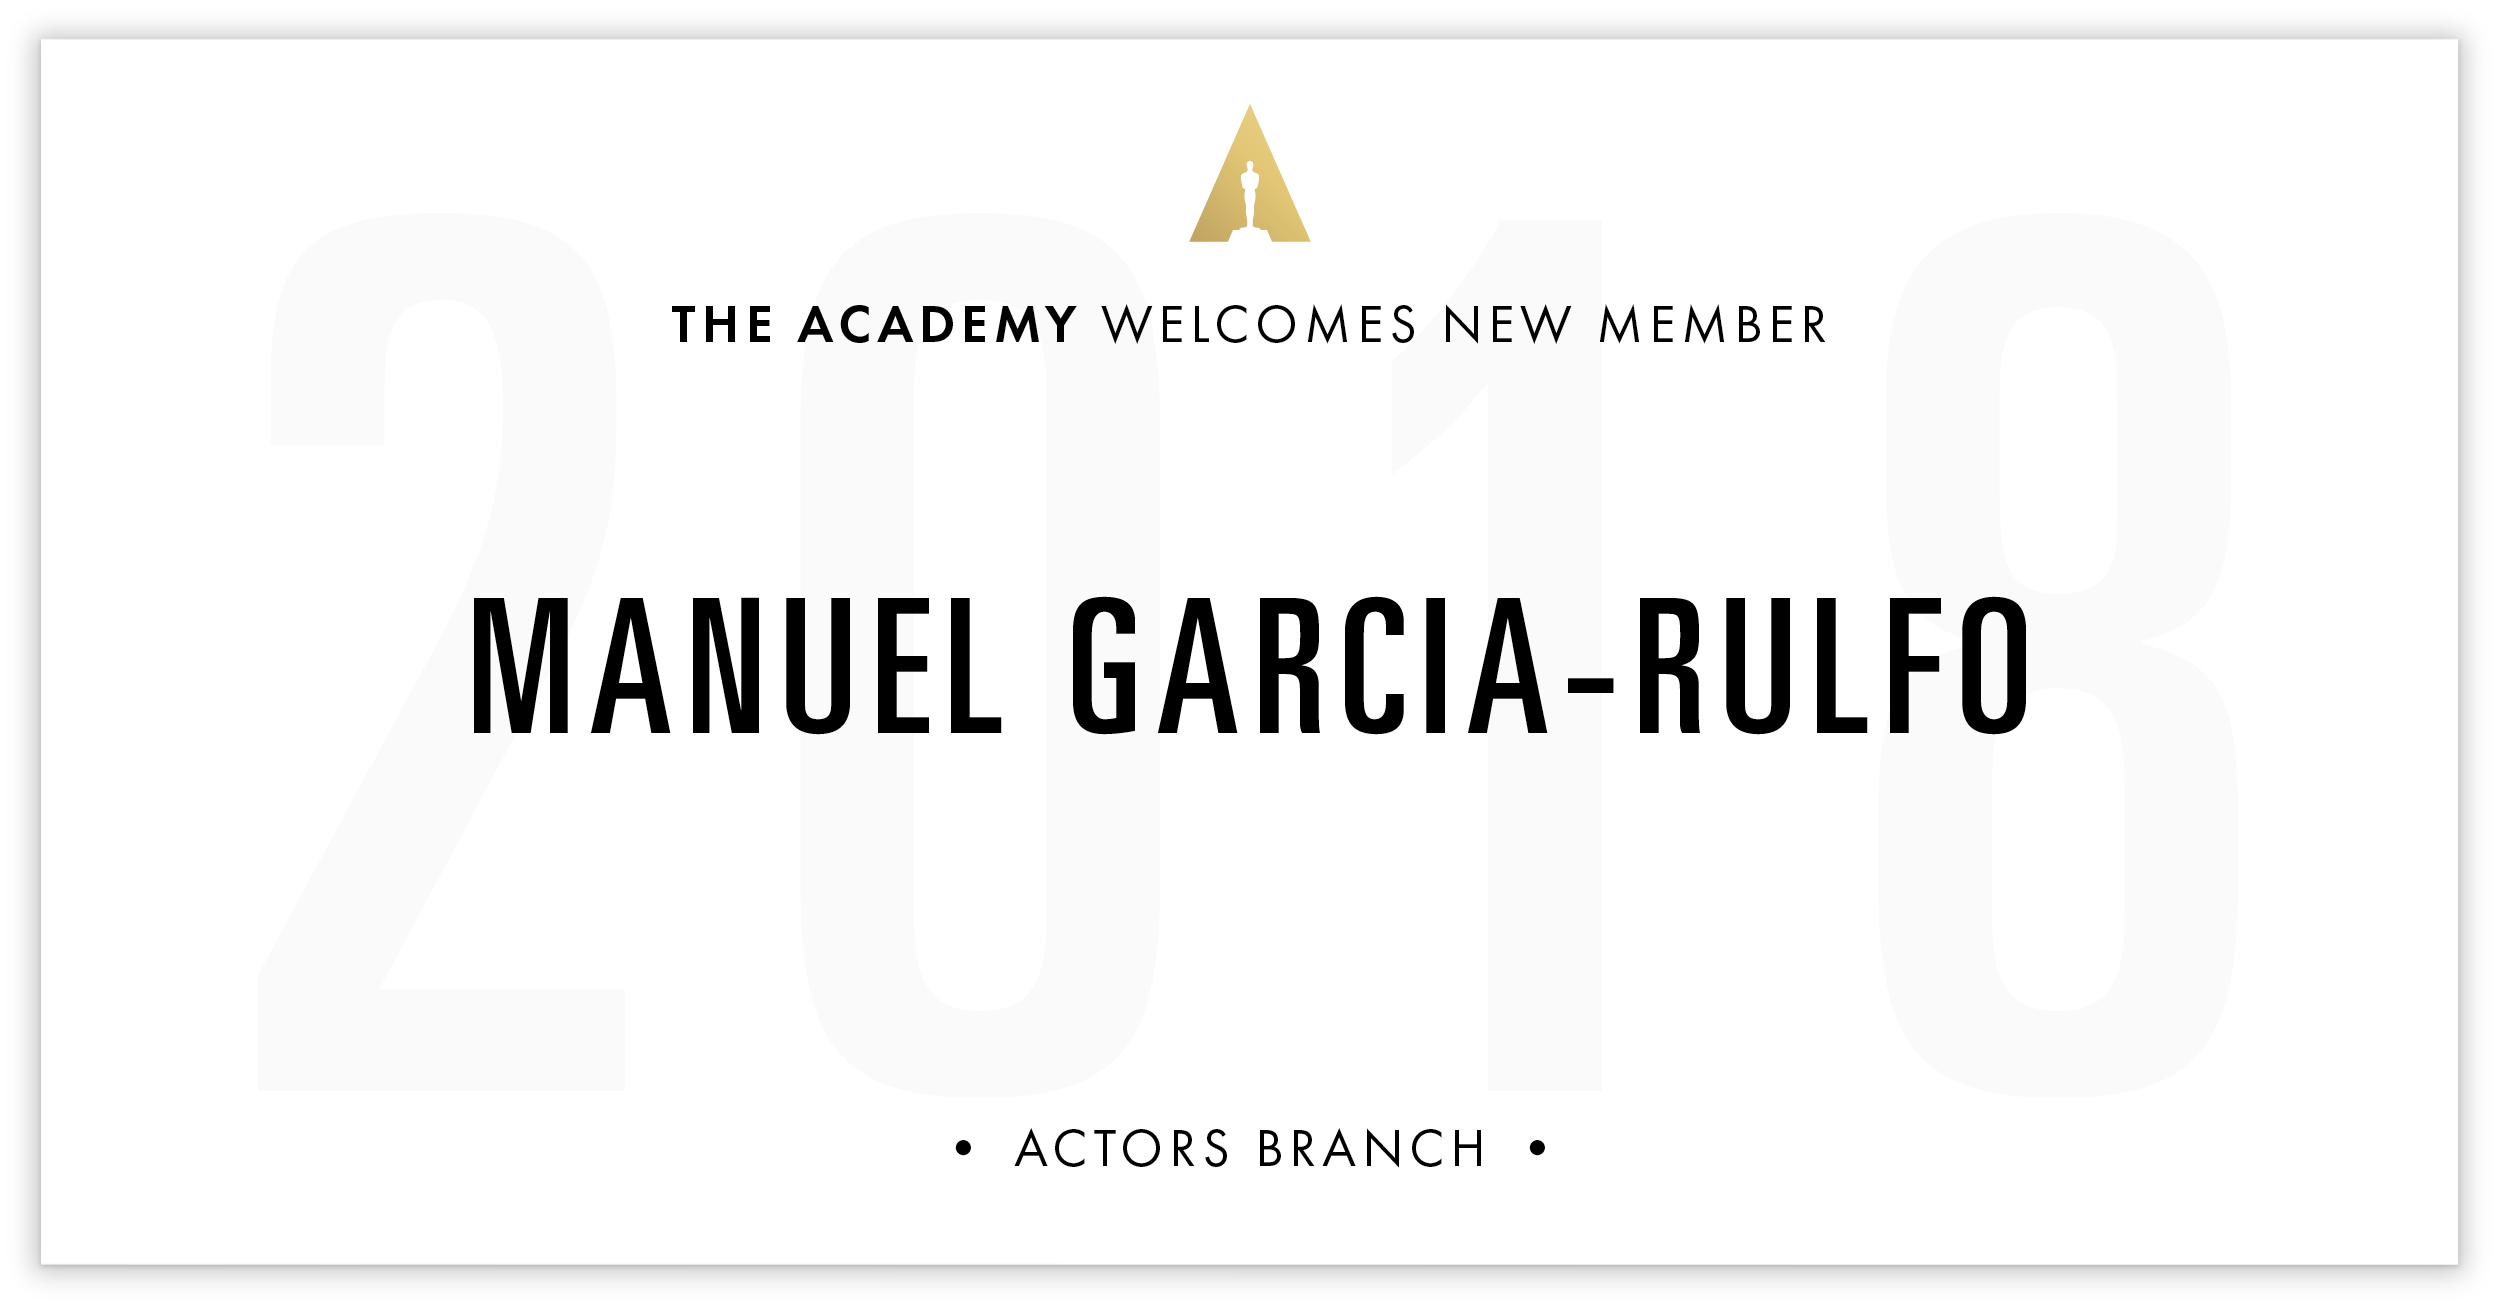 Manuel Garcia-Rulfo is invited!